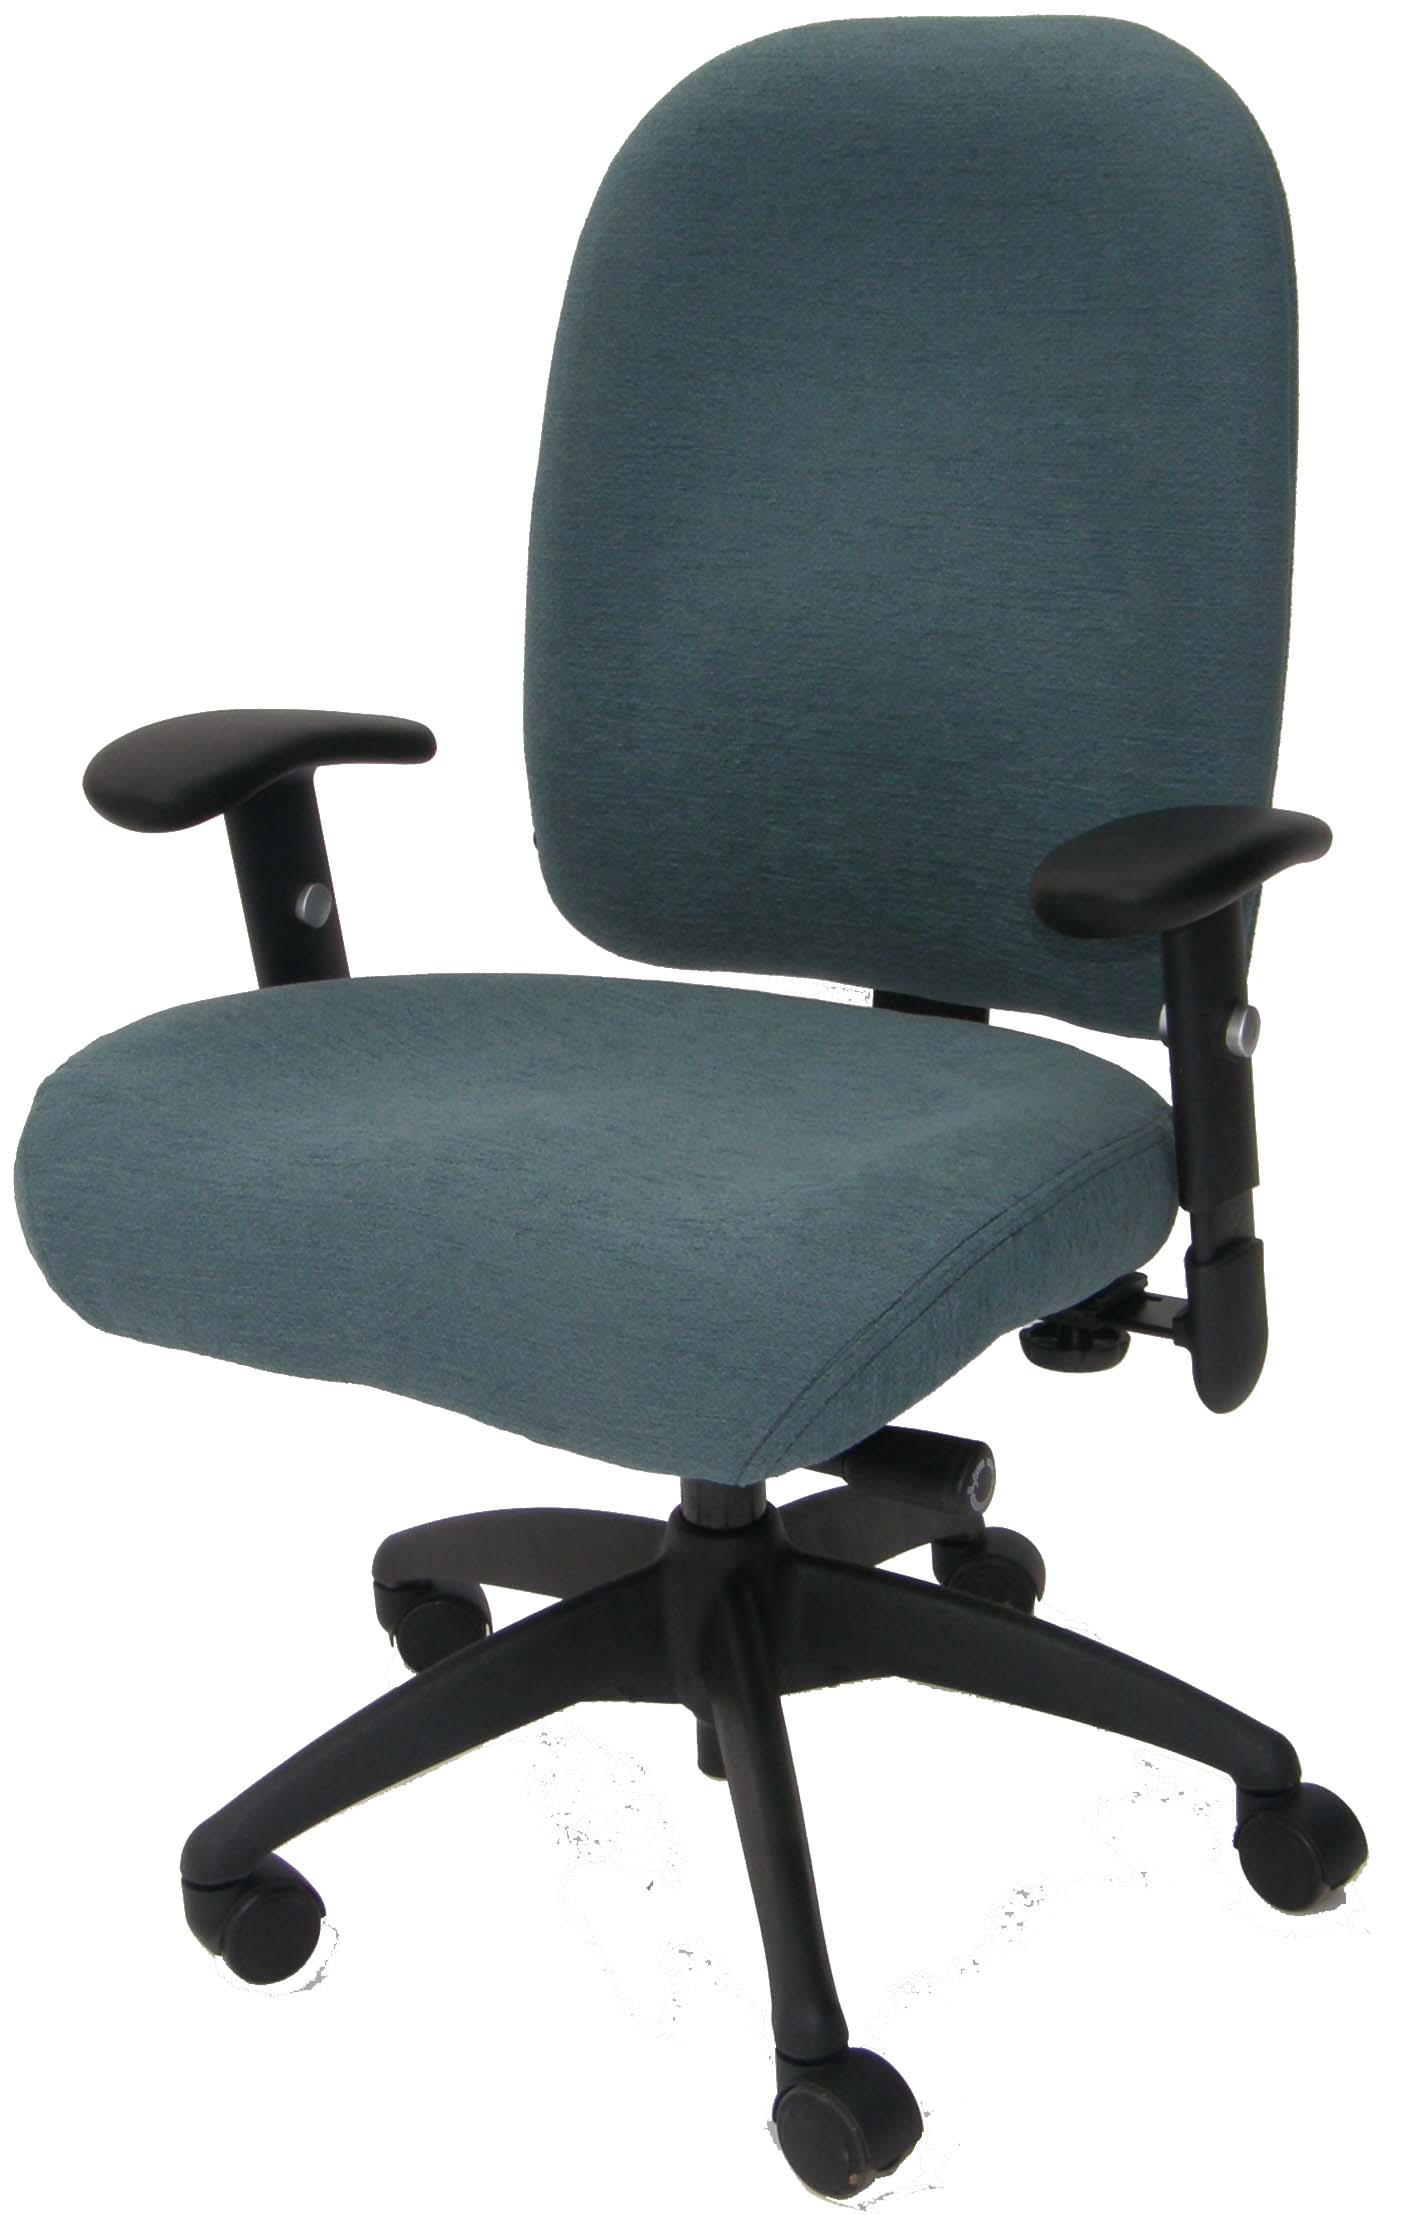 mvp extreme ergonomic chair champion seatingchampion seating